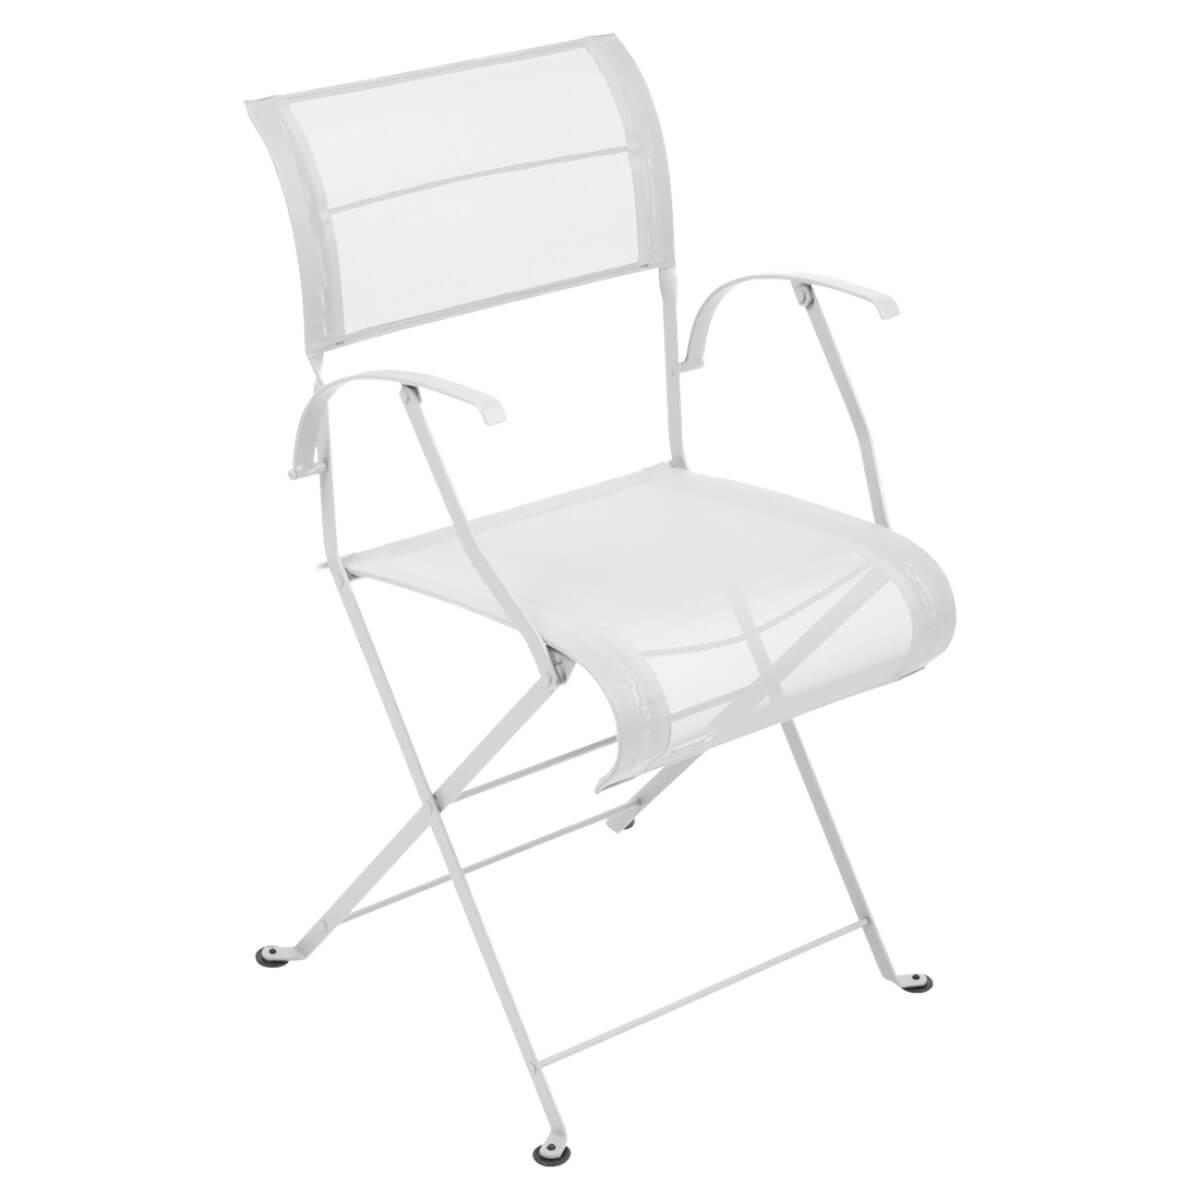 Chaise pliante bridge DUNE PREMIUM Fermob blanc coton